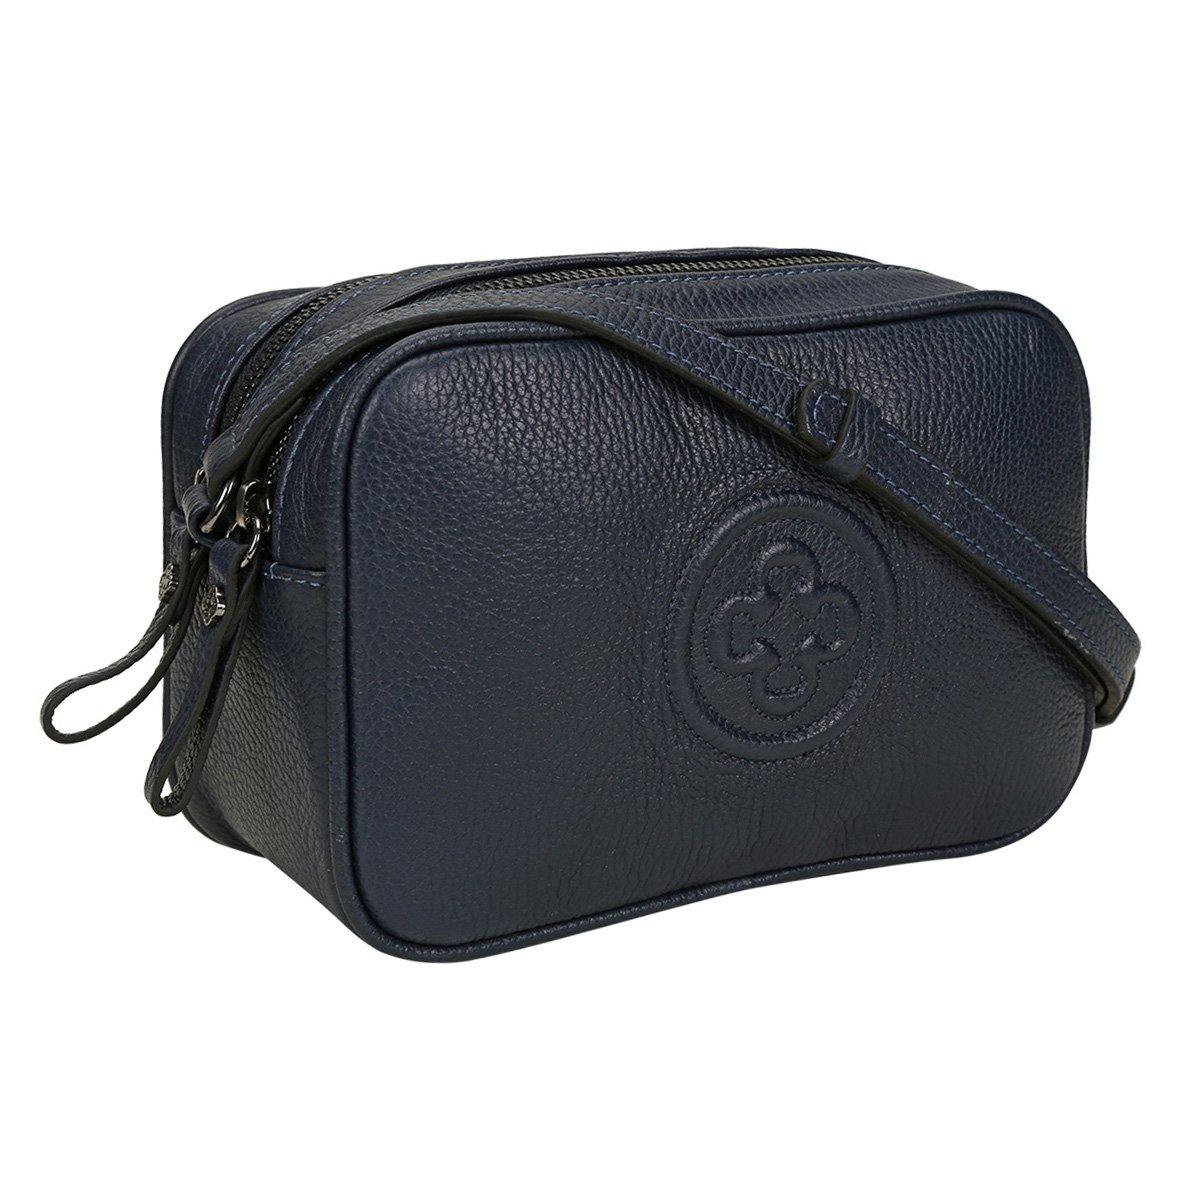 Mini Feminina Mini Capodarte Bolsa Monograma Marinho Couro Capodarte Bolsa Bag Couro Bag 14qdpwxf1